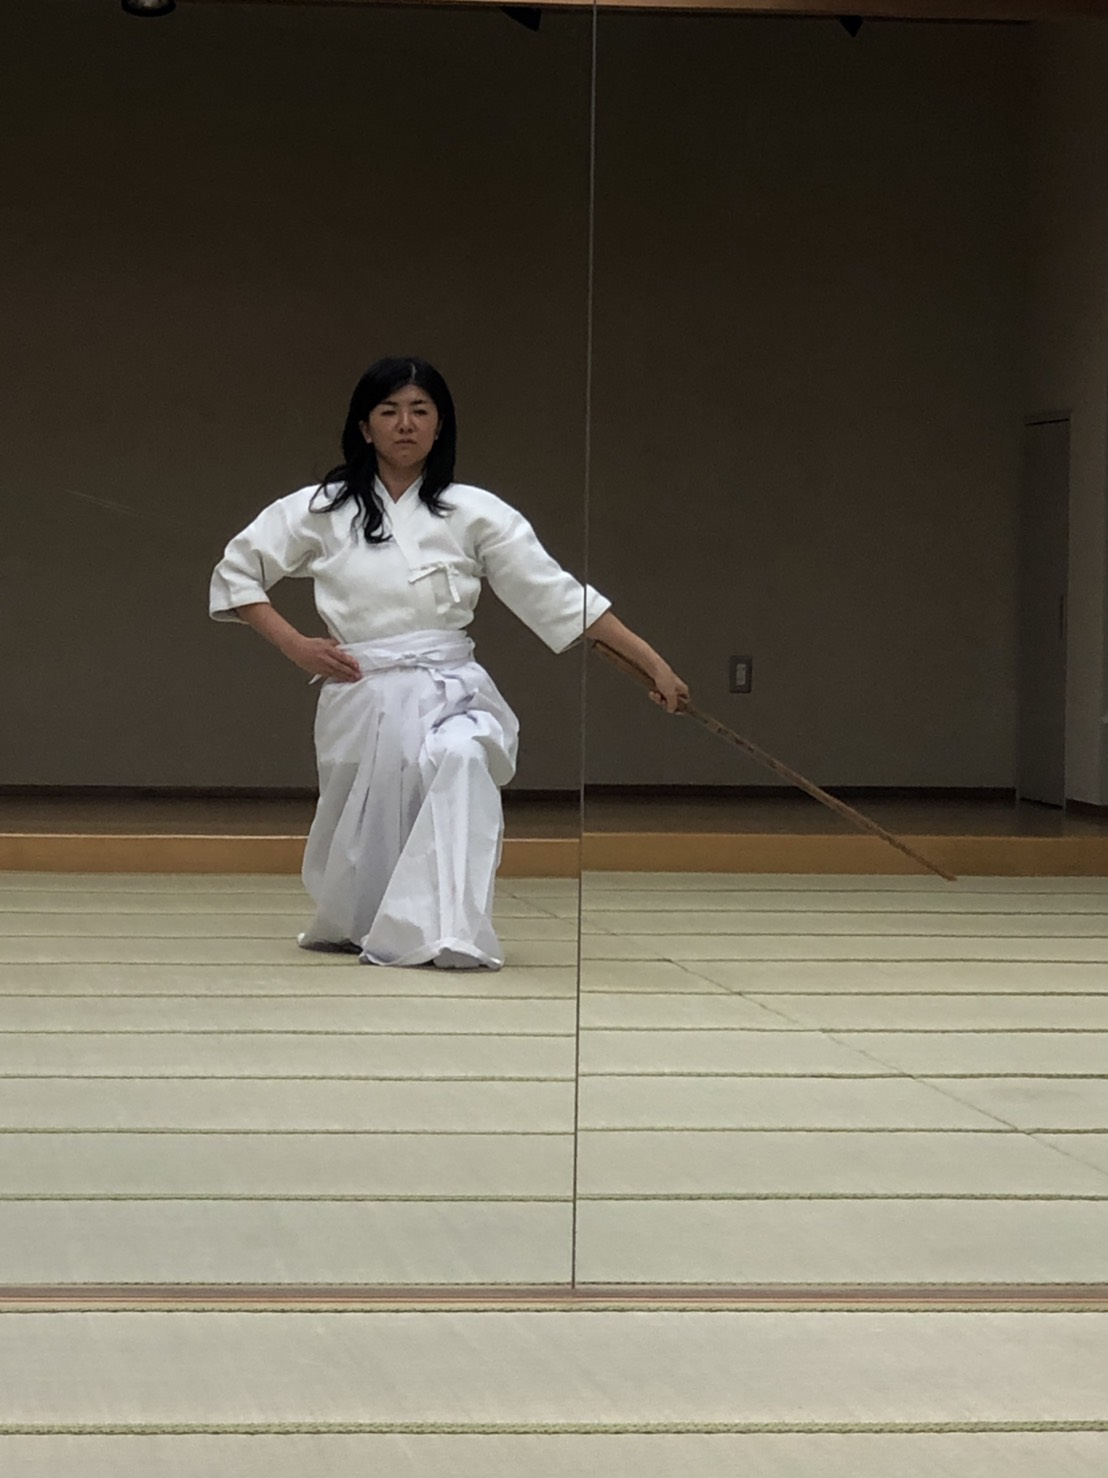 S  85254214 - 釈正輪老師、武道礼法&呼吸法開催